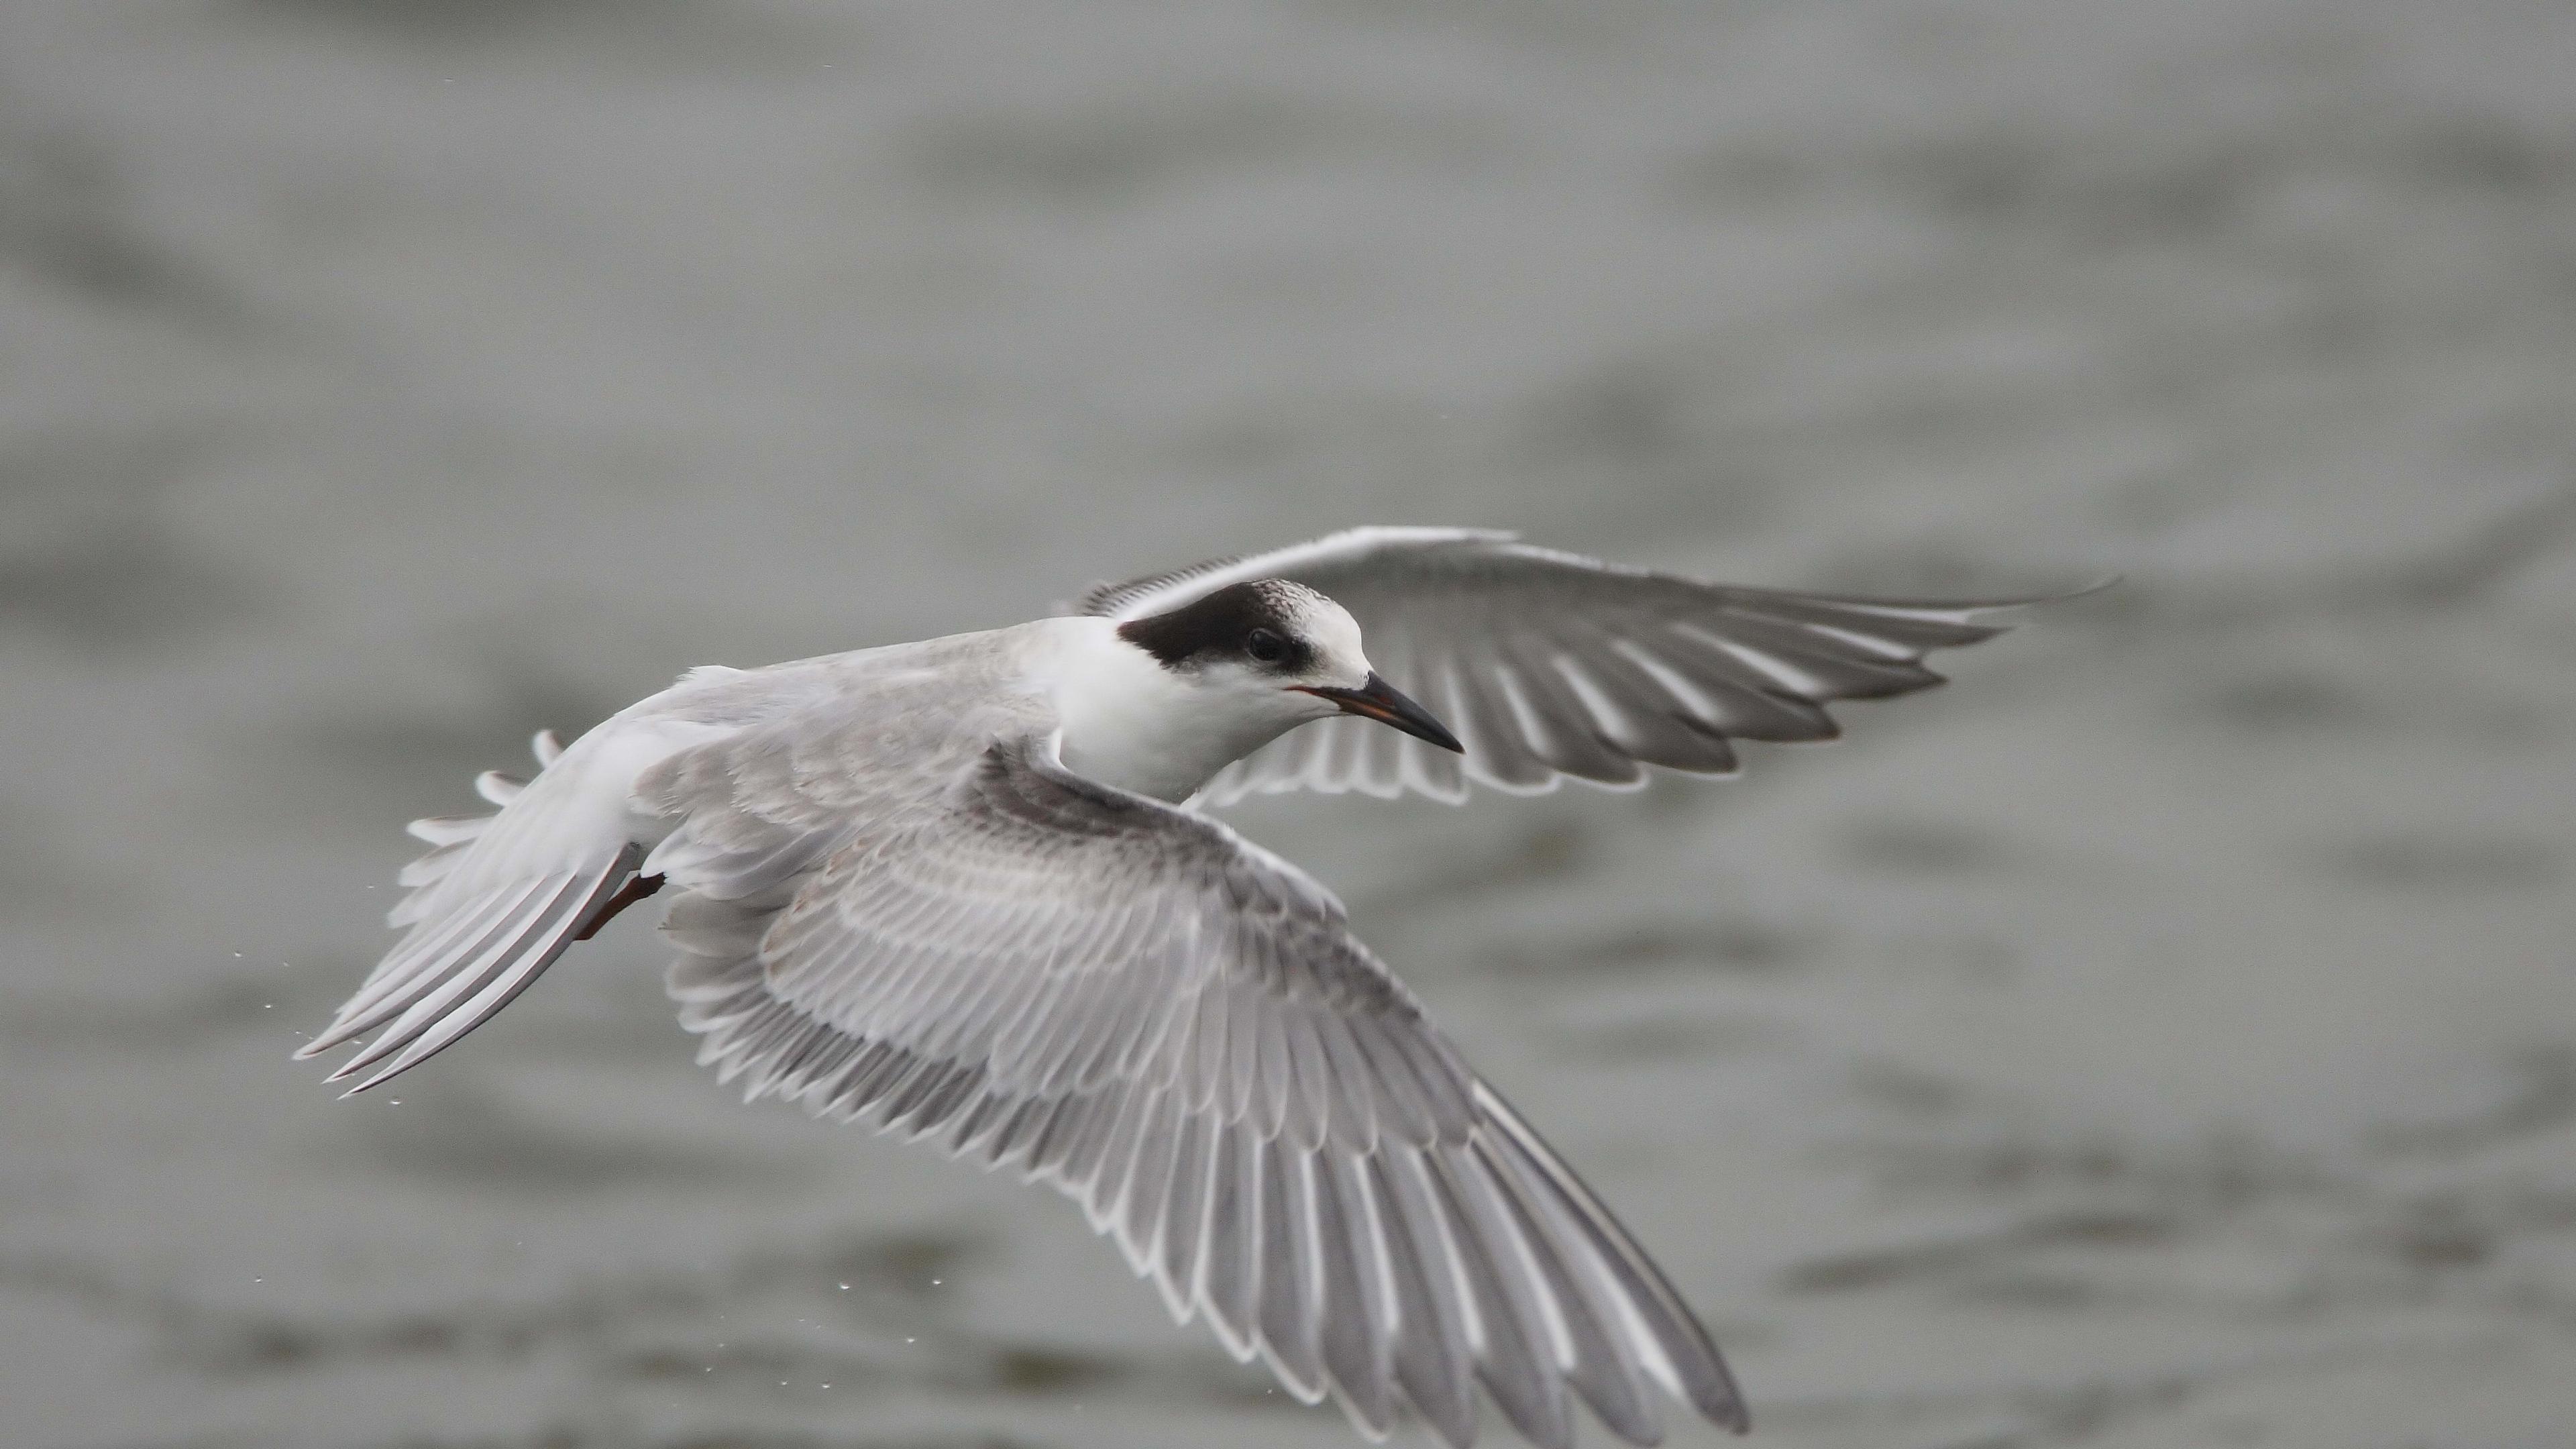 seagull flying flap wings 4k 1542242130 - seagull, flying, flap, wings 4k - Seagull, Flying, flap